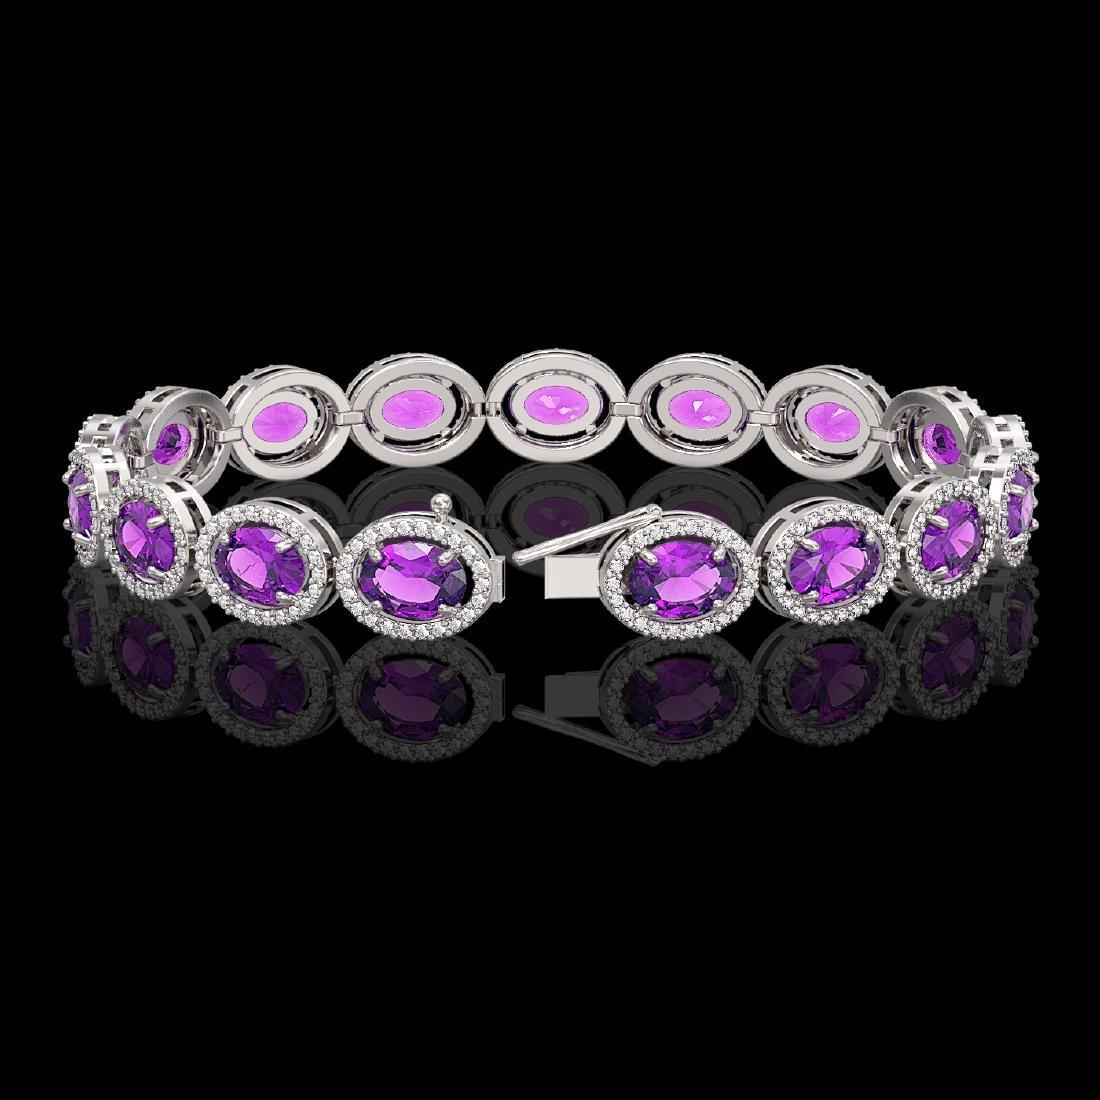 19.82 CTW Amethyst & Diamond Halo Bracelet 10K White - 2